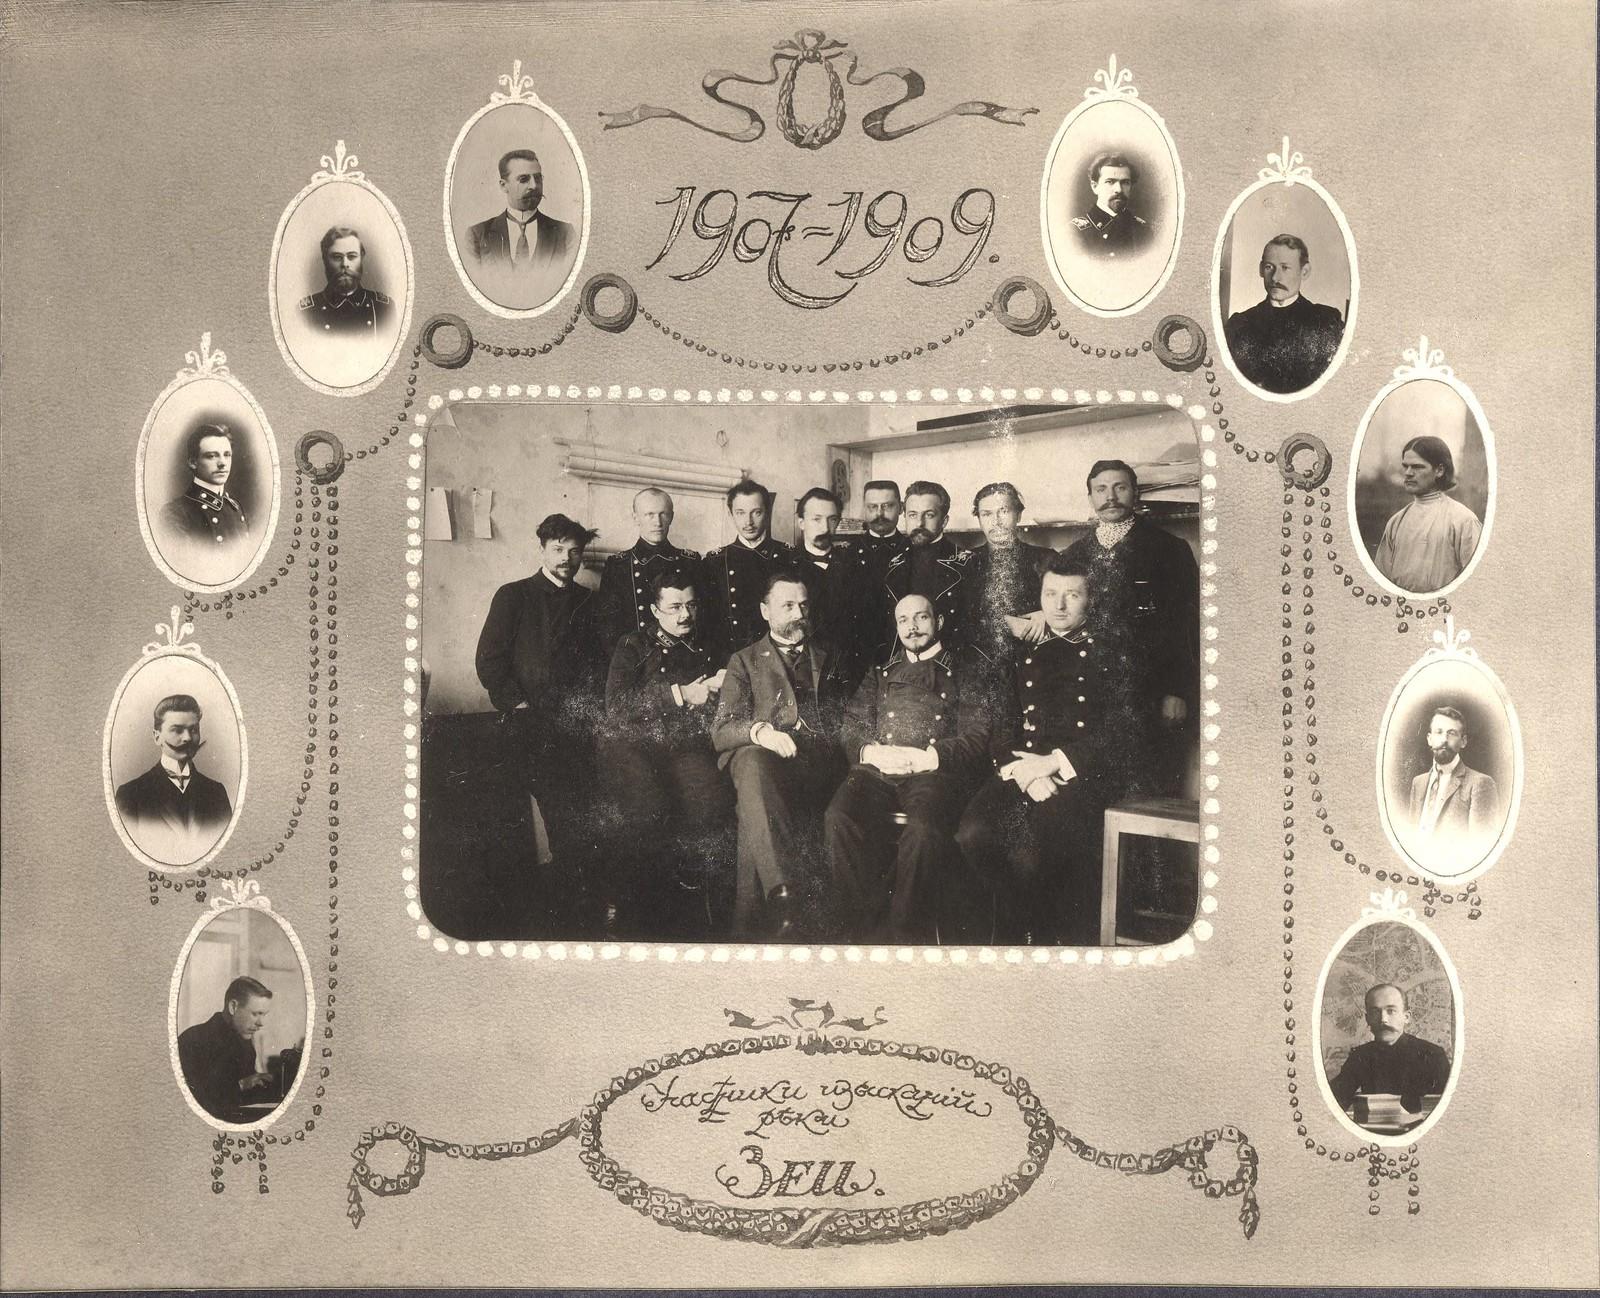 Участники проведения изысканий реки Зеи в 1907-1909 гг.